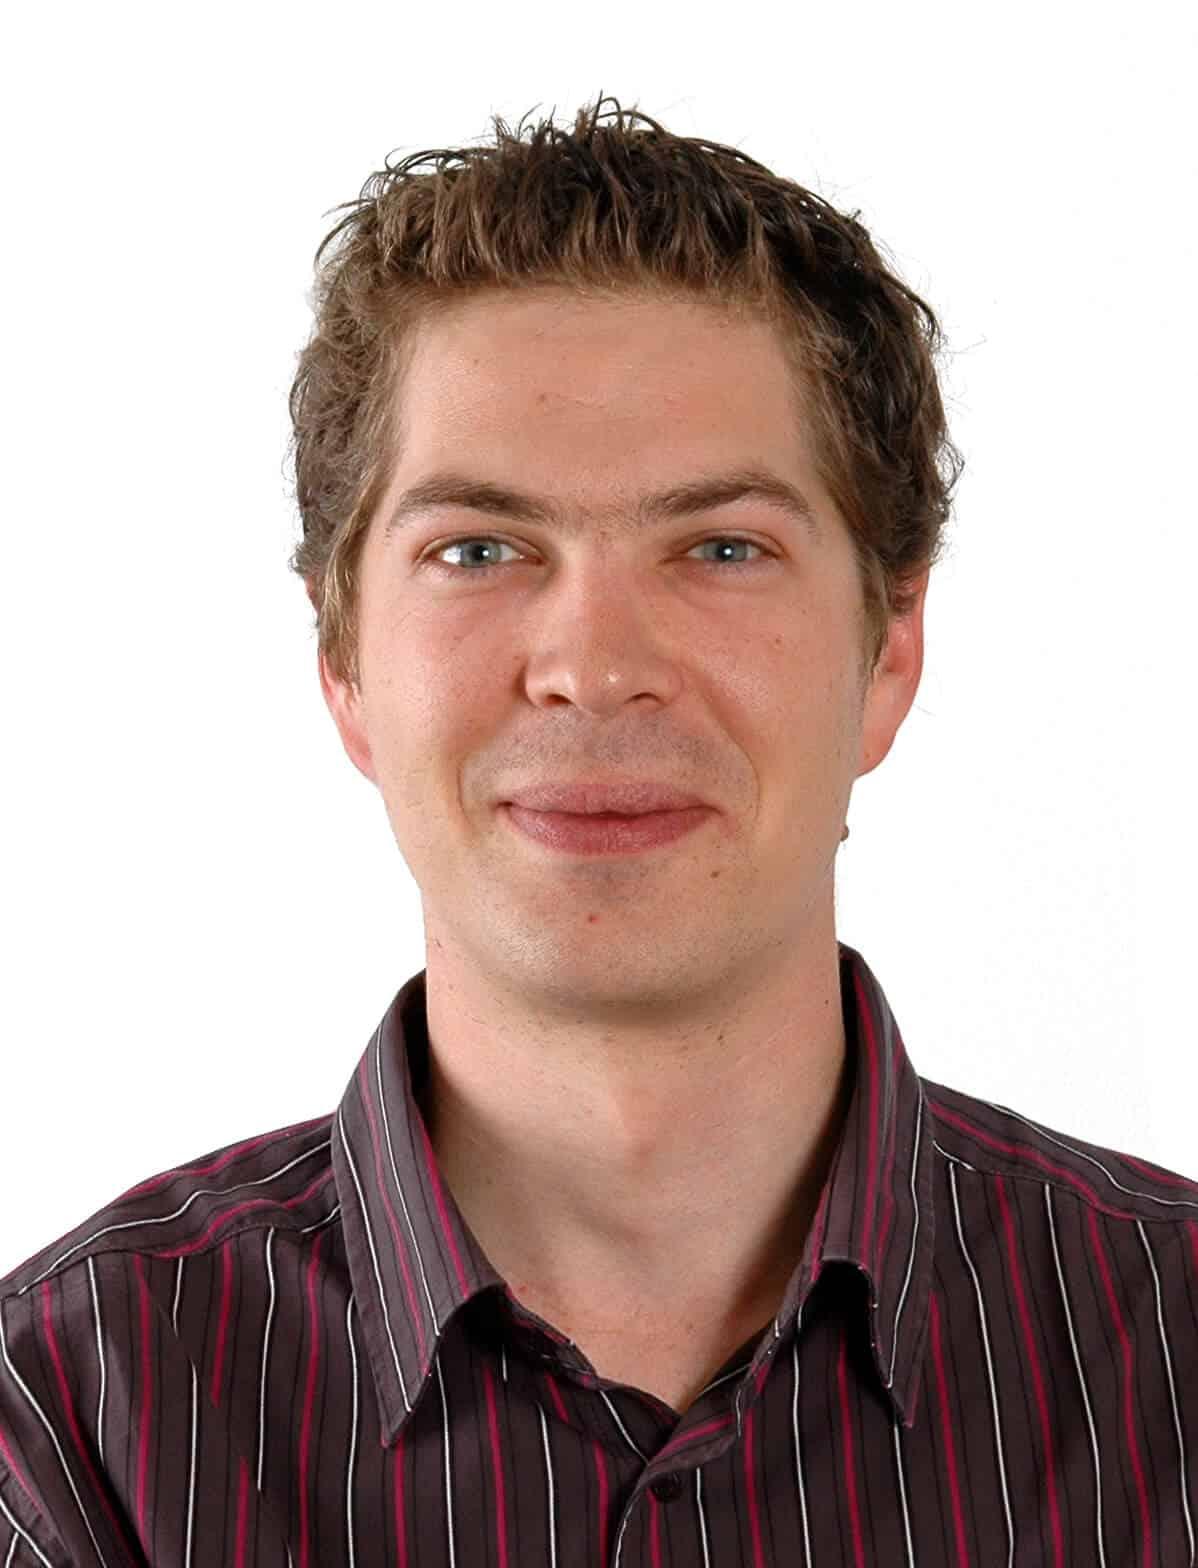 Laurent Timmerman